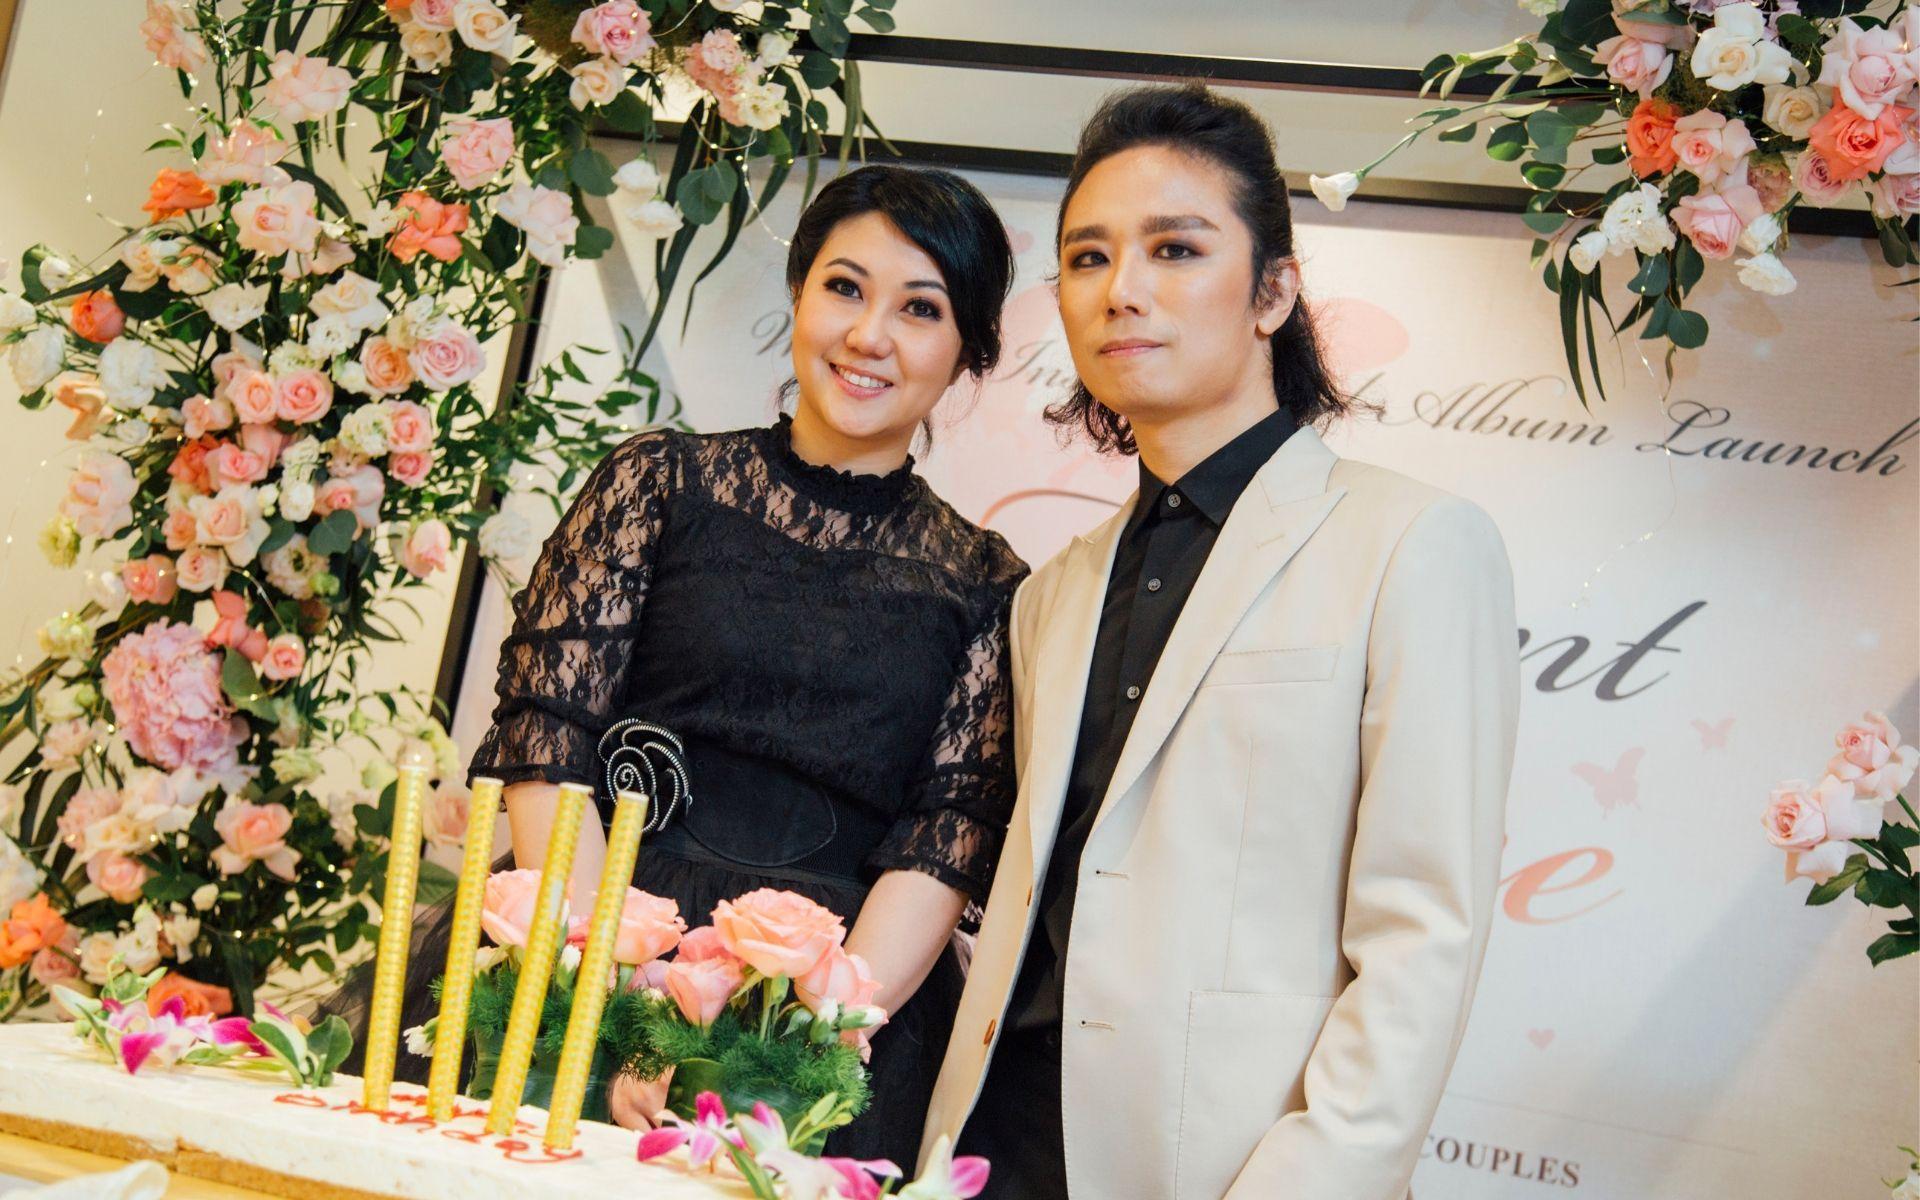 Gloria Tan and Ken Lee